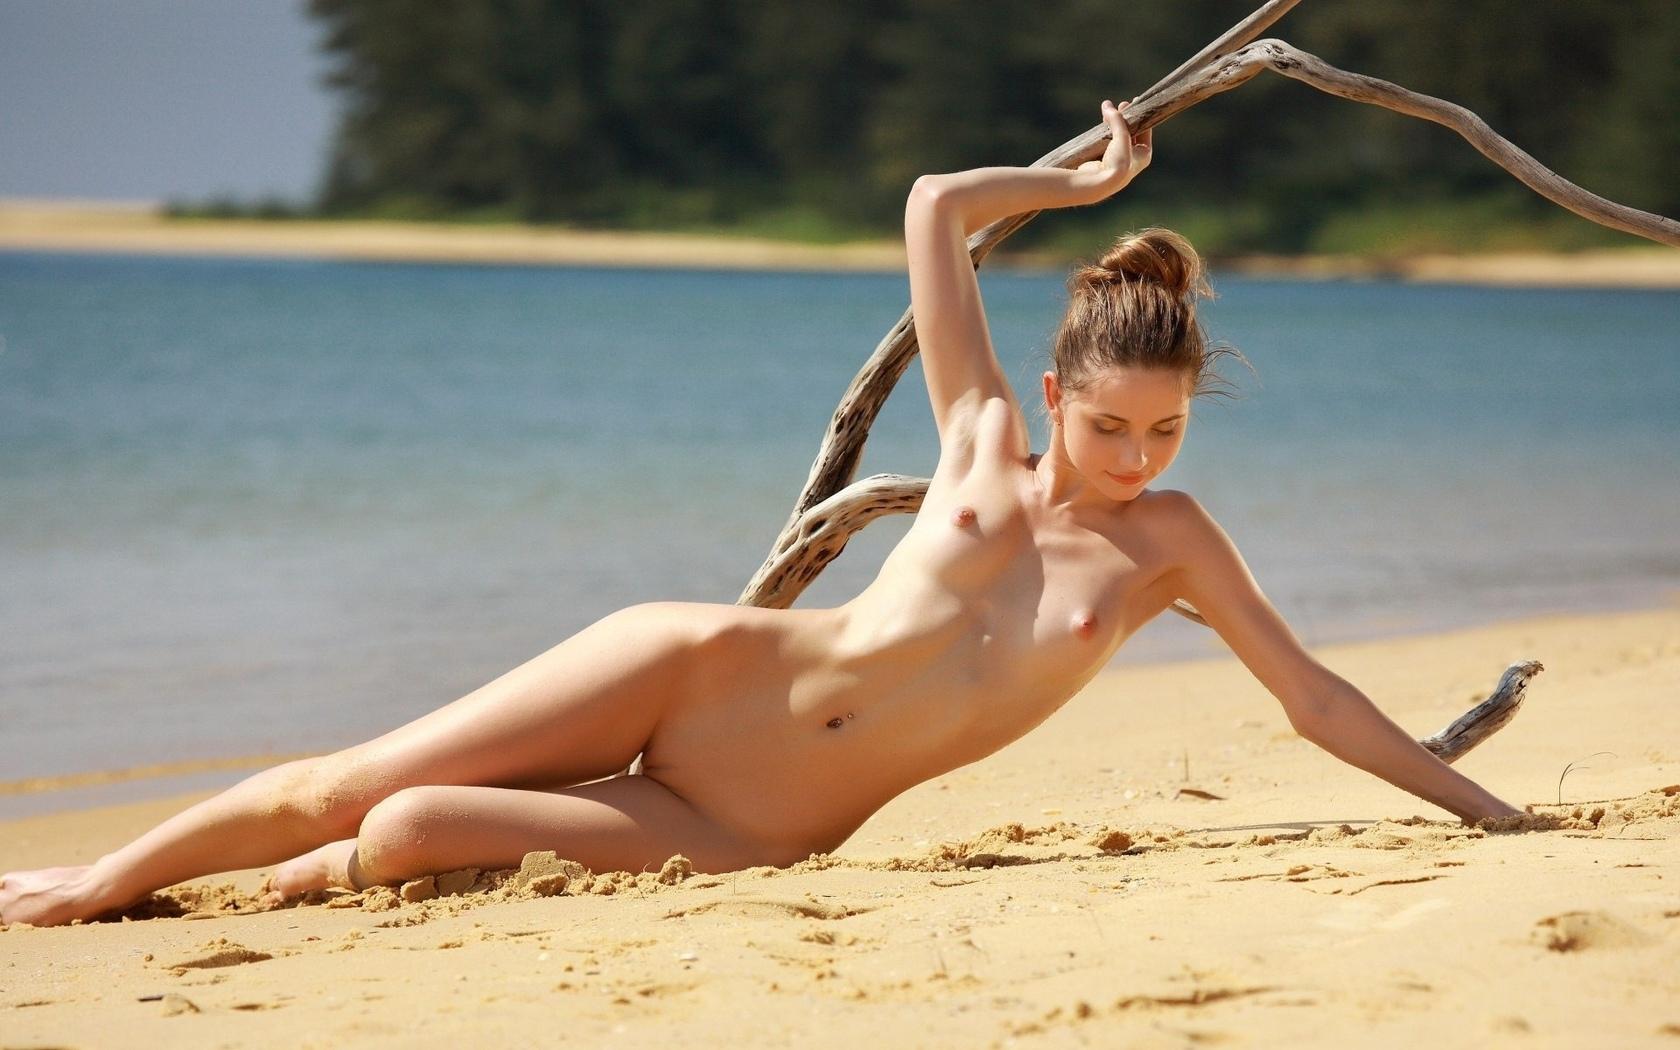 Russian nudist beach babe